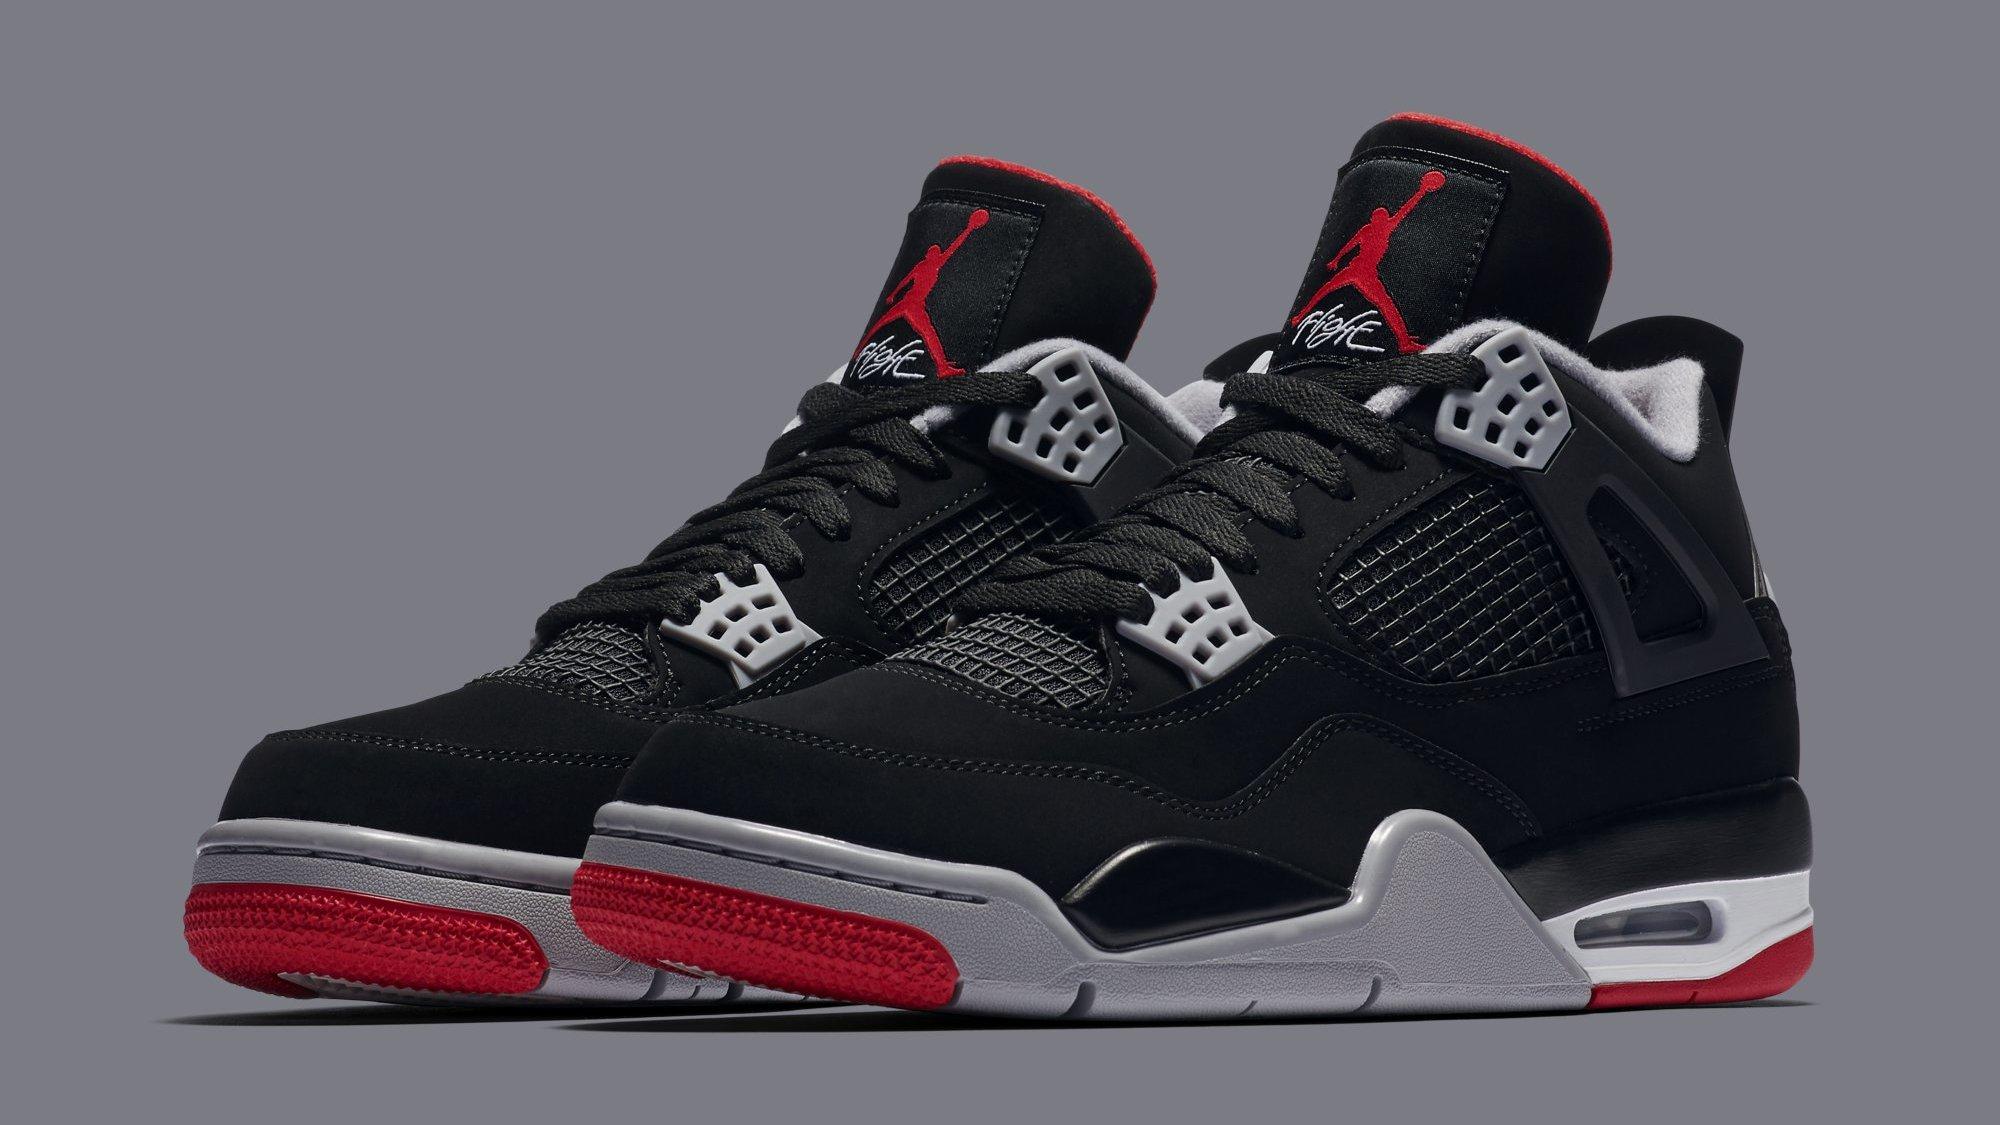 7ce6f588353b5 Air Jordan 4 Retro 'Black/Cement Grey/Summit White/Fire Red' 308497-060  Release Date | Sole Collector